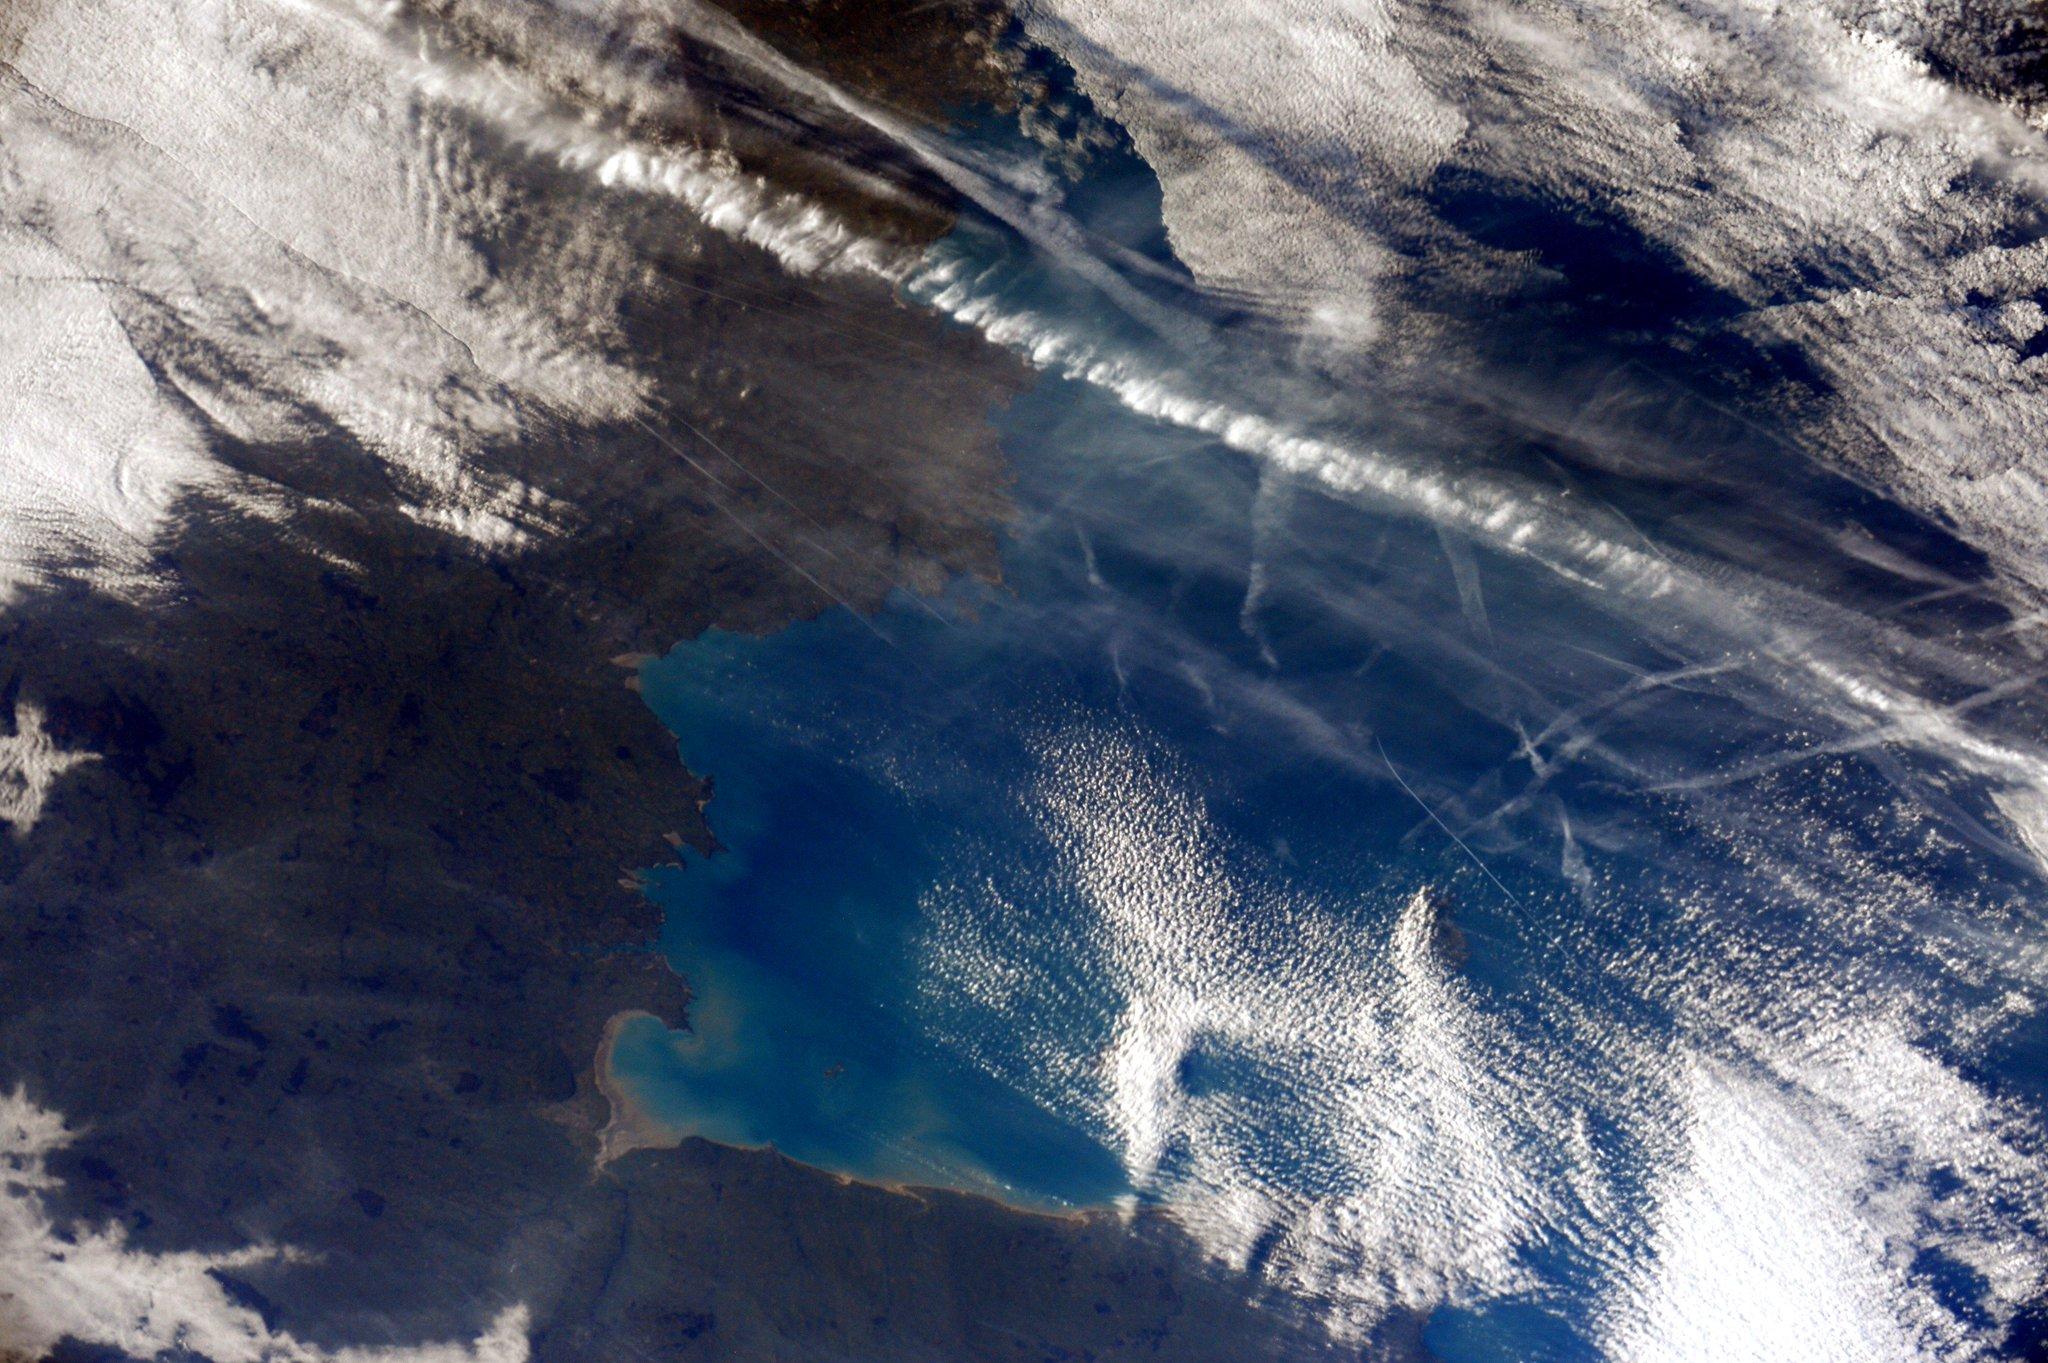 Hello #France! The Gulf of Saint- Malo on a winter day / (IT) Ciao Francia, un invernale Golfo di Saint-Malo. http://t.co/XyKUMnJPQB